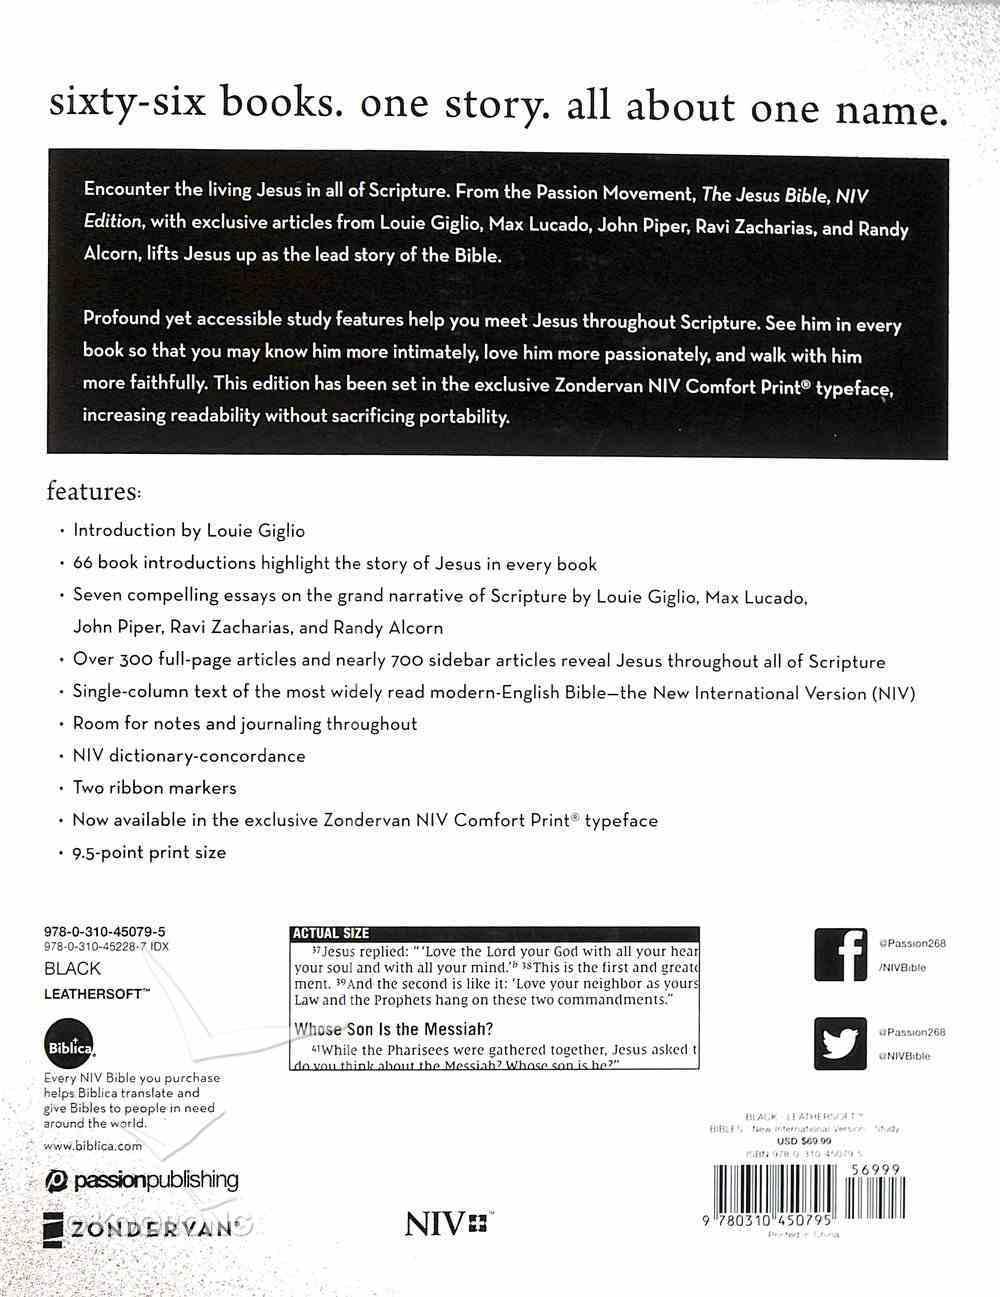 NIV the Jesus Bible Black Comfort Print Edition (Black Letter Edition) Premium Imitation Leather